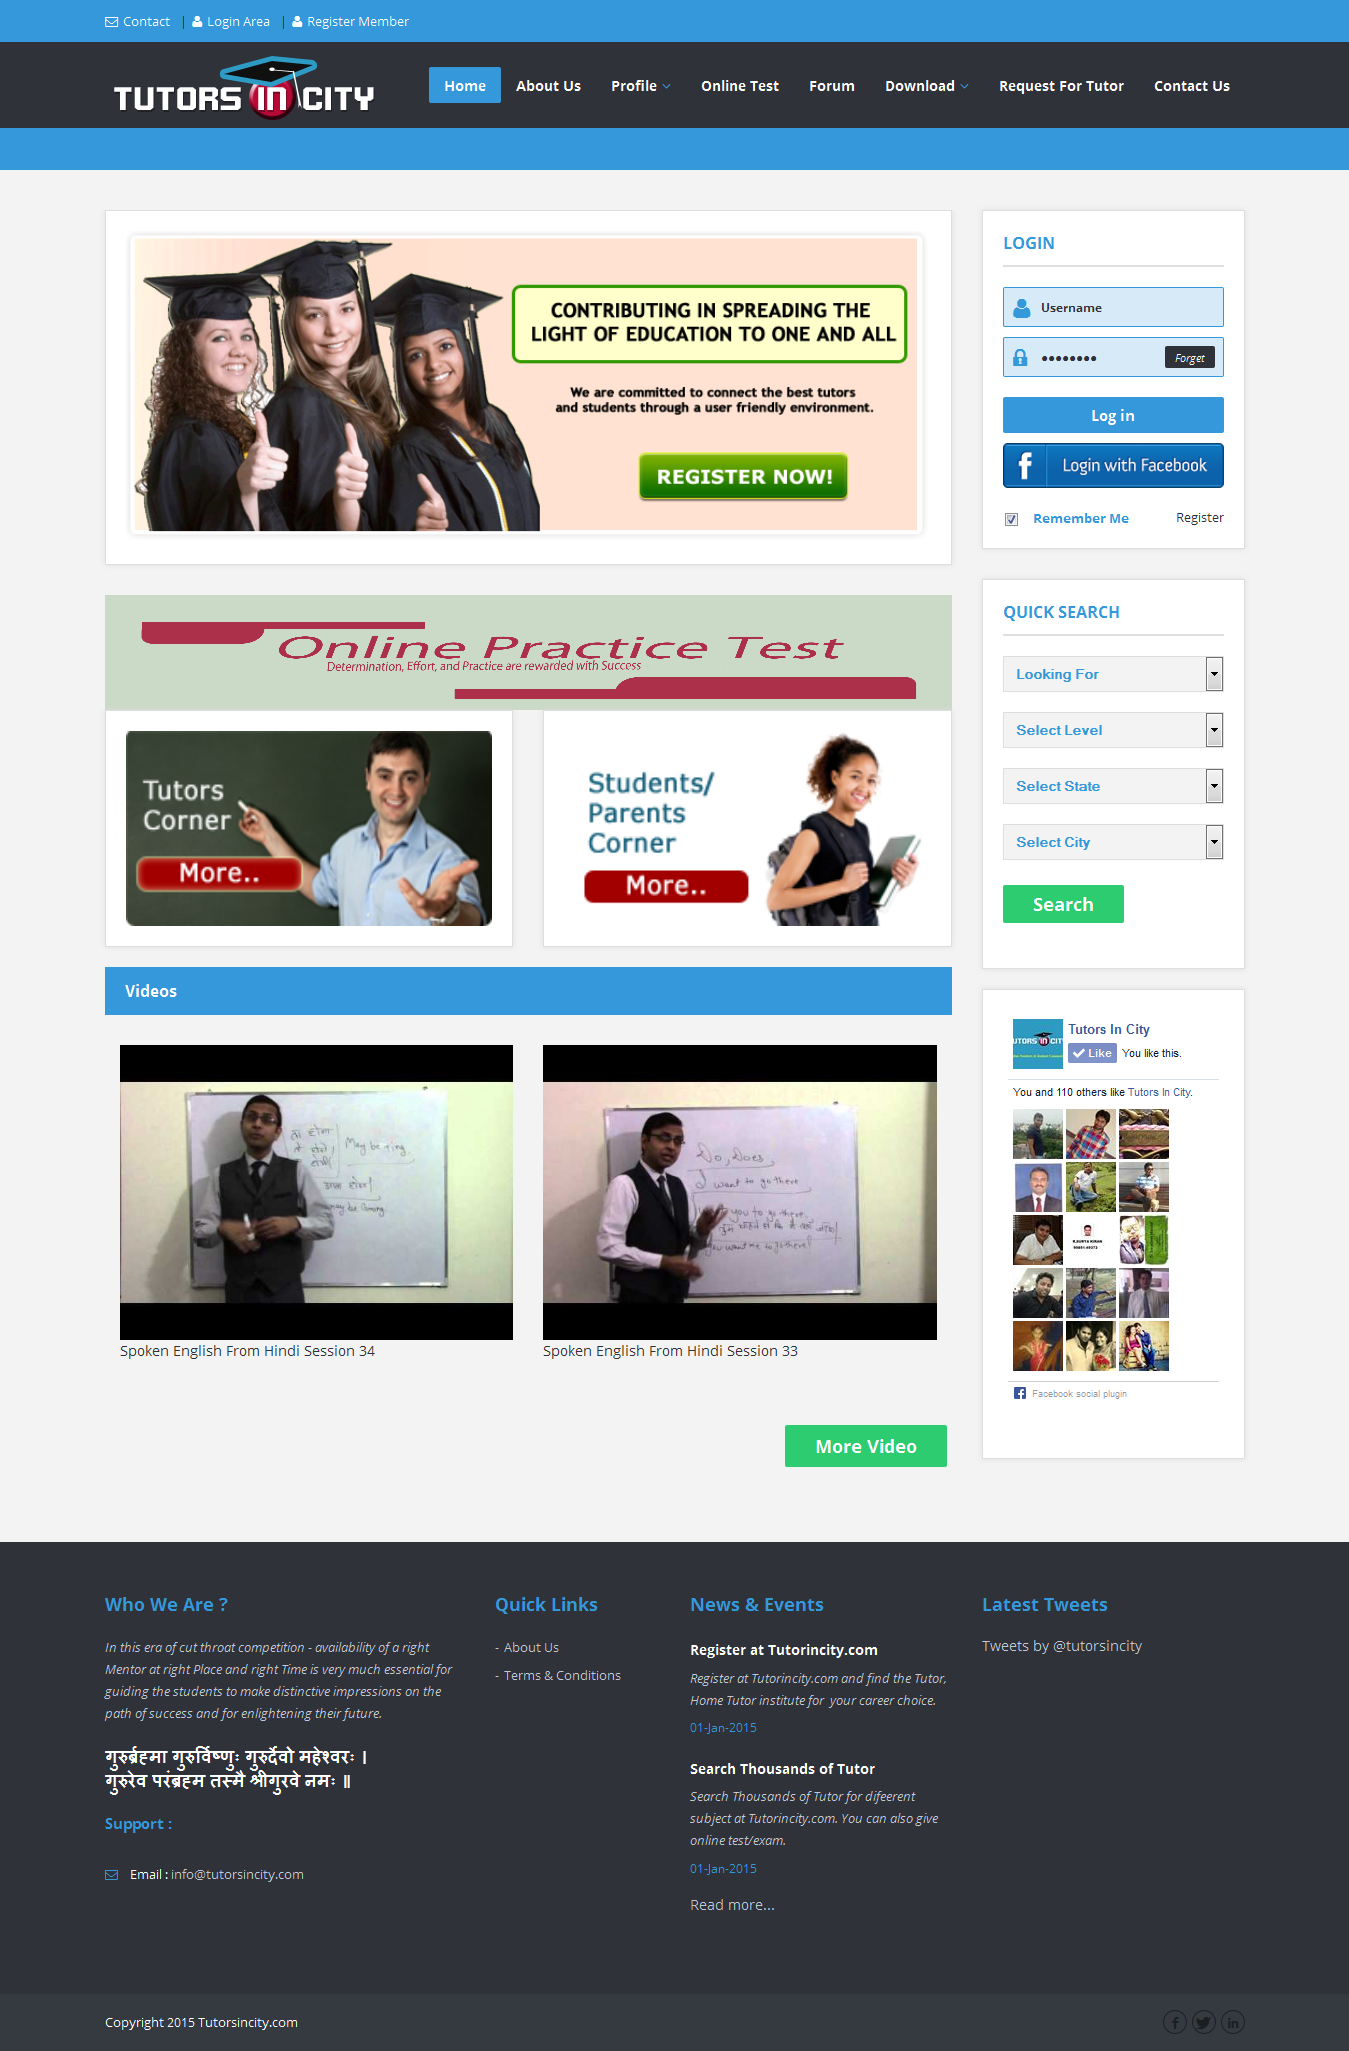 tutorsincity_com